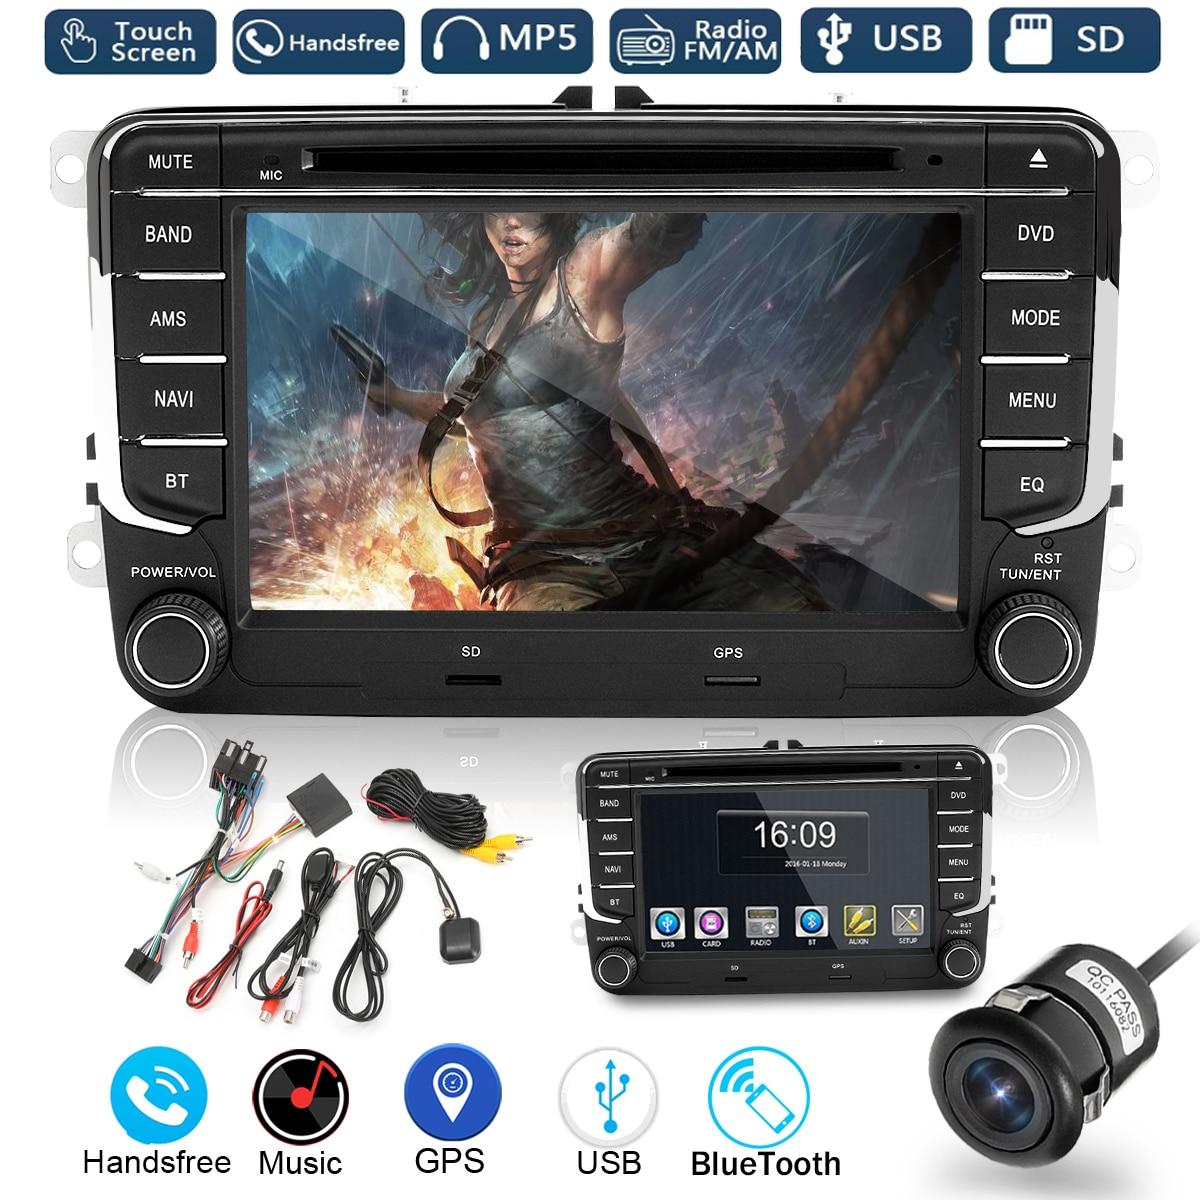 Kroak 7 Inch 2 Din Car DVD Player Radio GPS Navigaiton Sat Nav Stereo Camera for VW /Passat /Golf /Jetta /Skoda антенны телевизионные ritmix антенна телевизионная